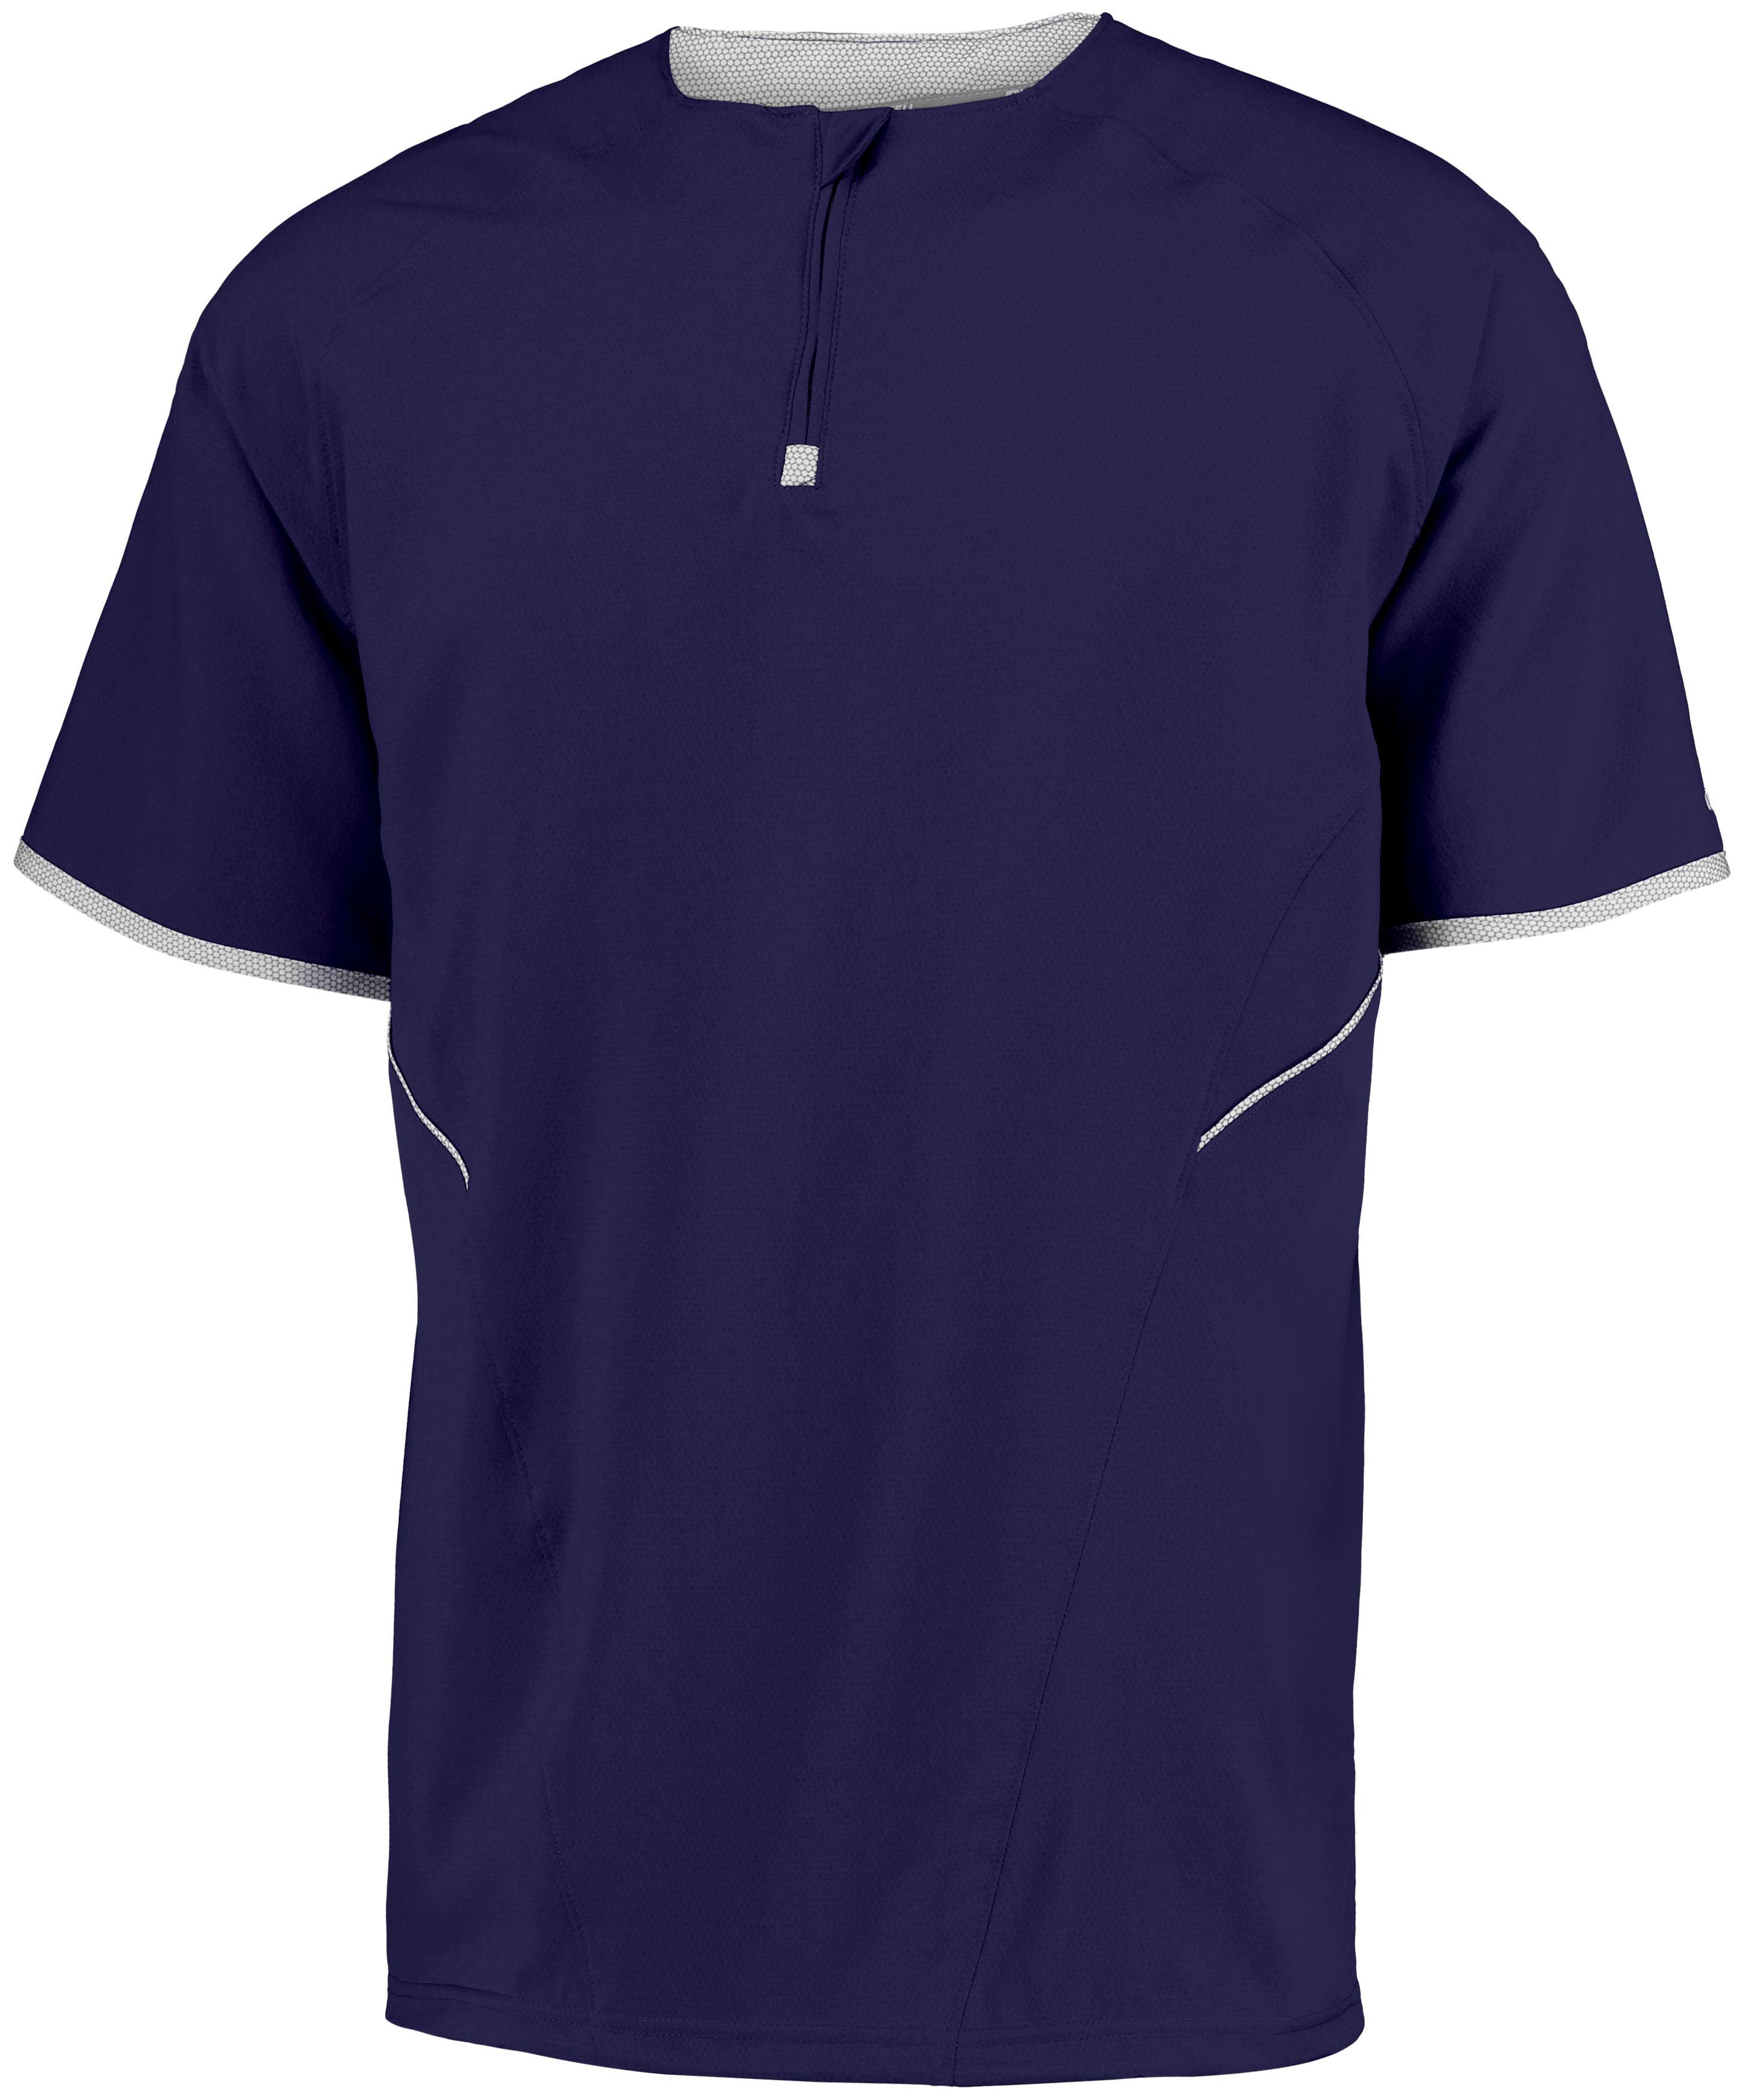 Short Sleeve Pullover - Purple/white